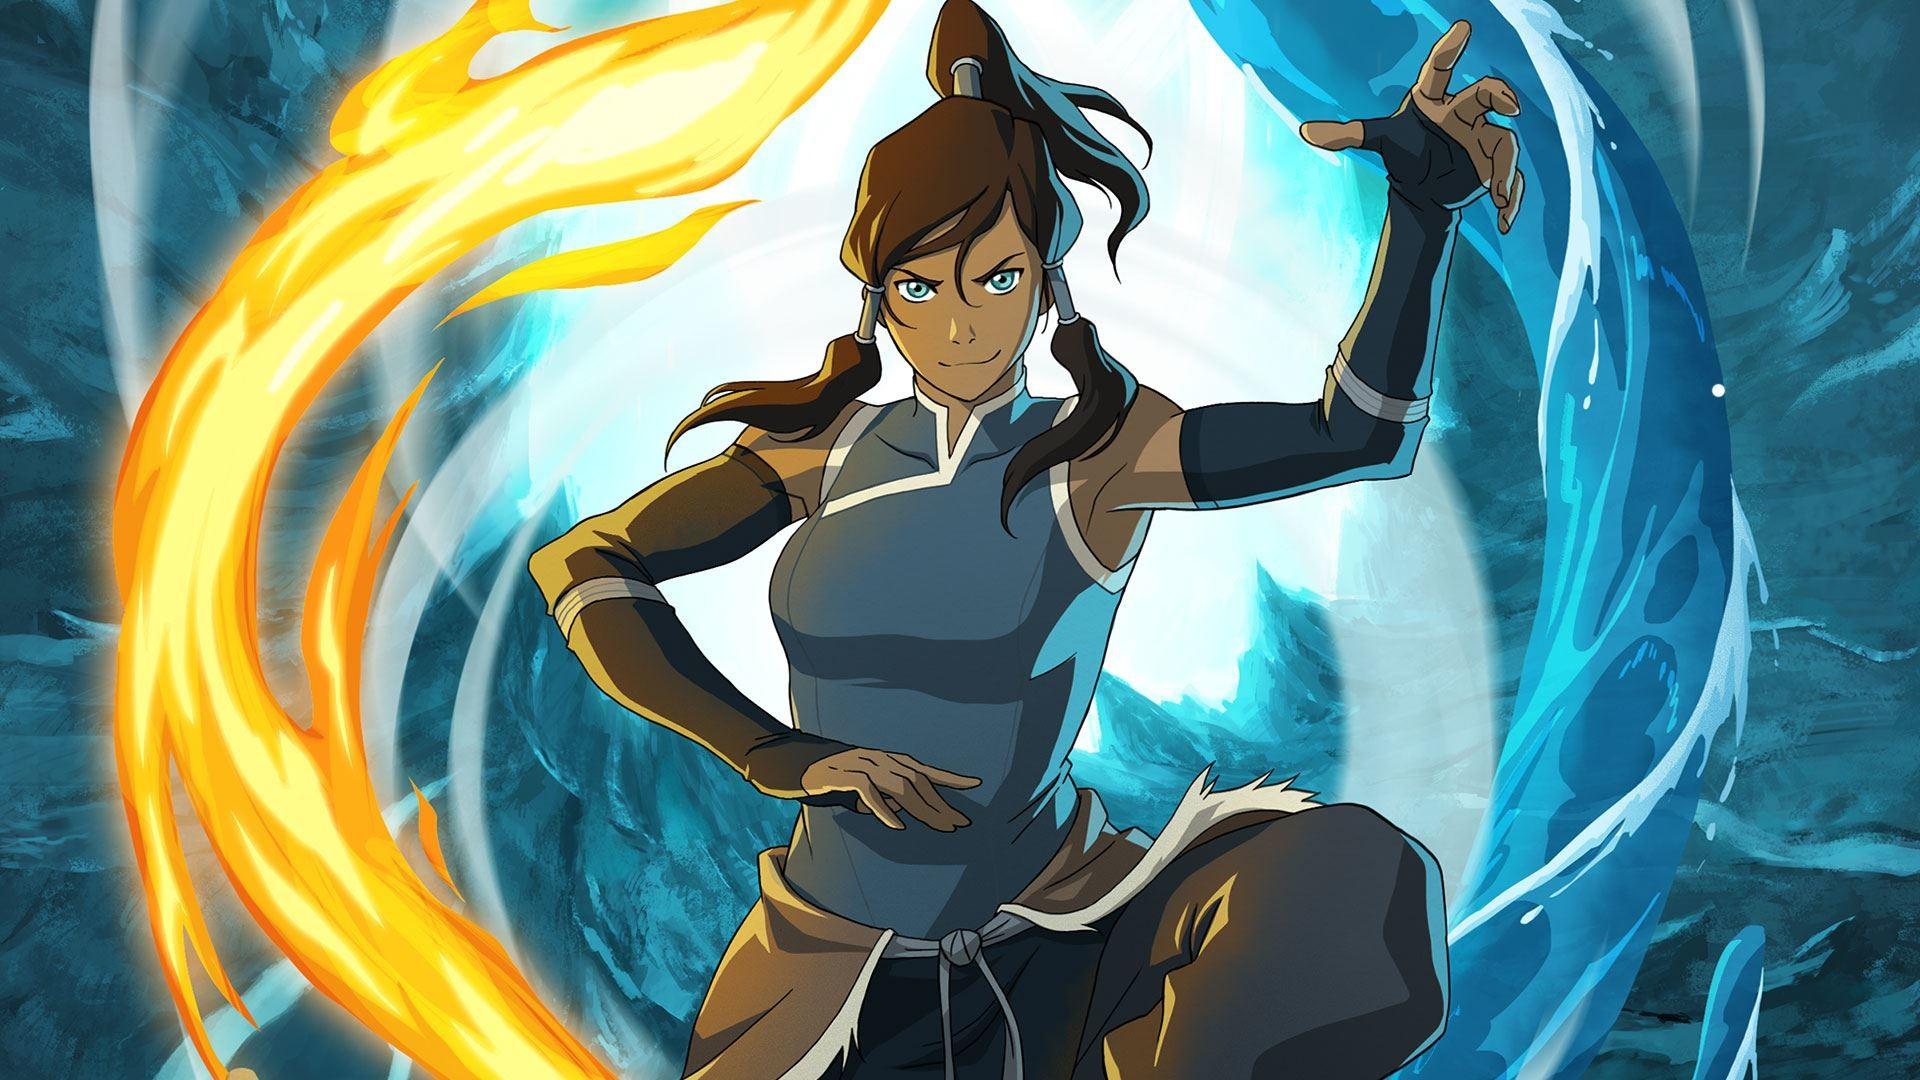 Wallpaper the legend of korra, avatar legend of the corre, girl,  magician